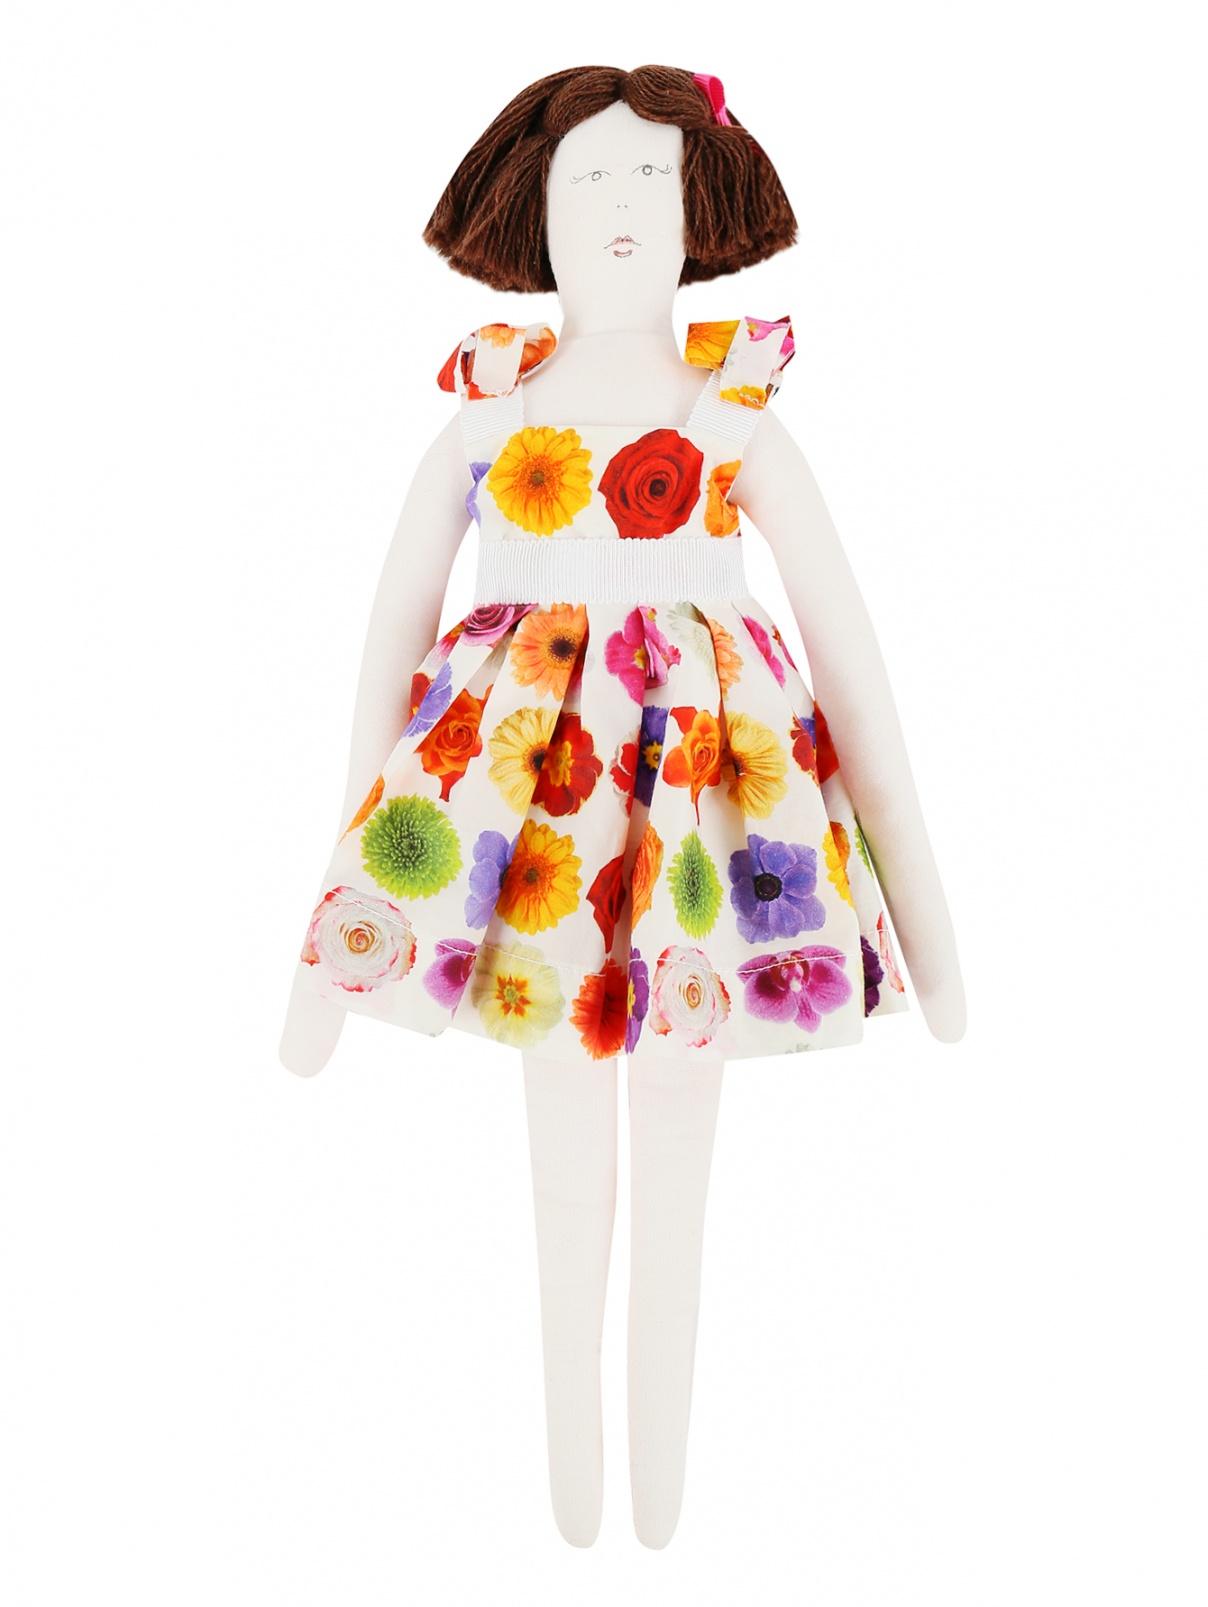 Кукла-тильда в сарафане Mi Mi Sol  –  Общий вид  – Цвет:  Мультиколор